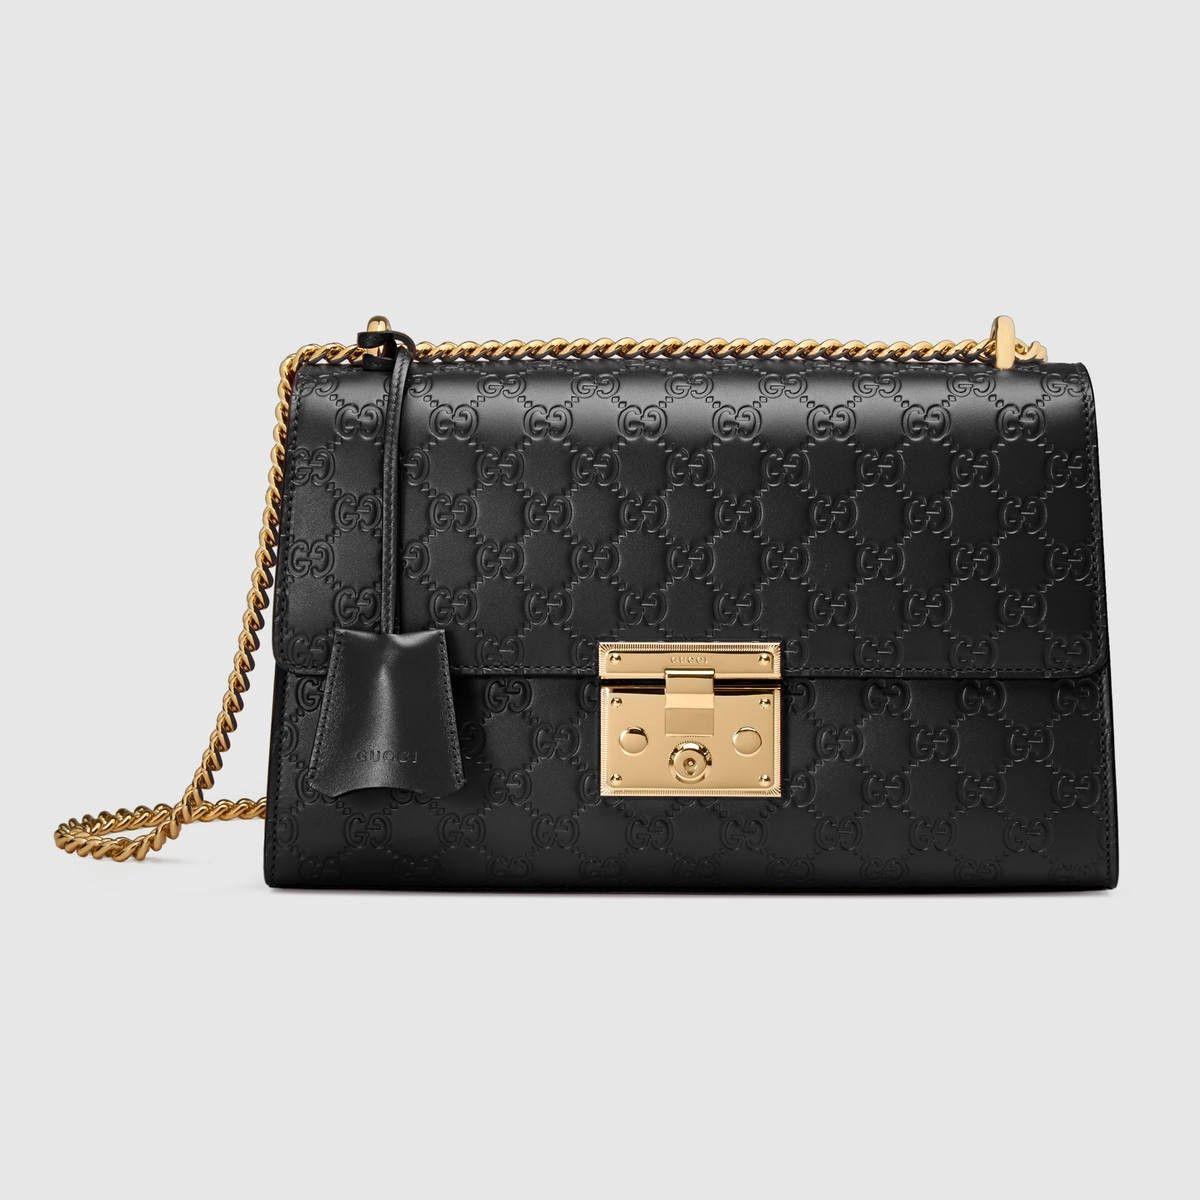 9b8485660e53 GUCCI Padlock Gucci Signature shoulder bag - black Gucci signature.  gucci   bags  shoulder bags  hand bags  lace  suede  lining